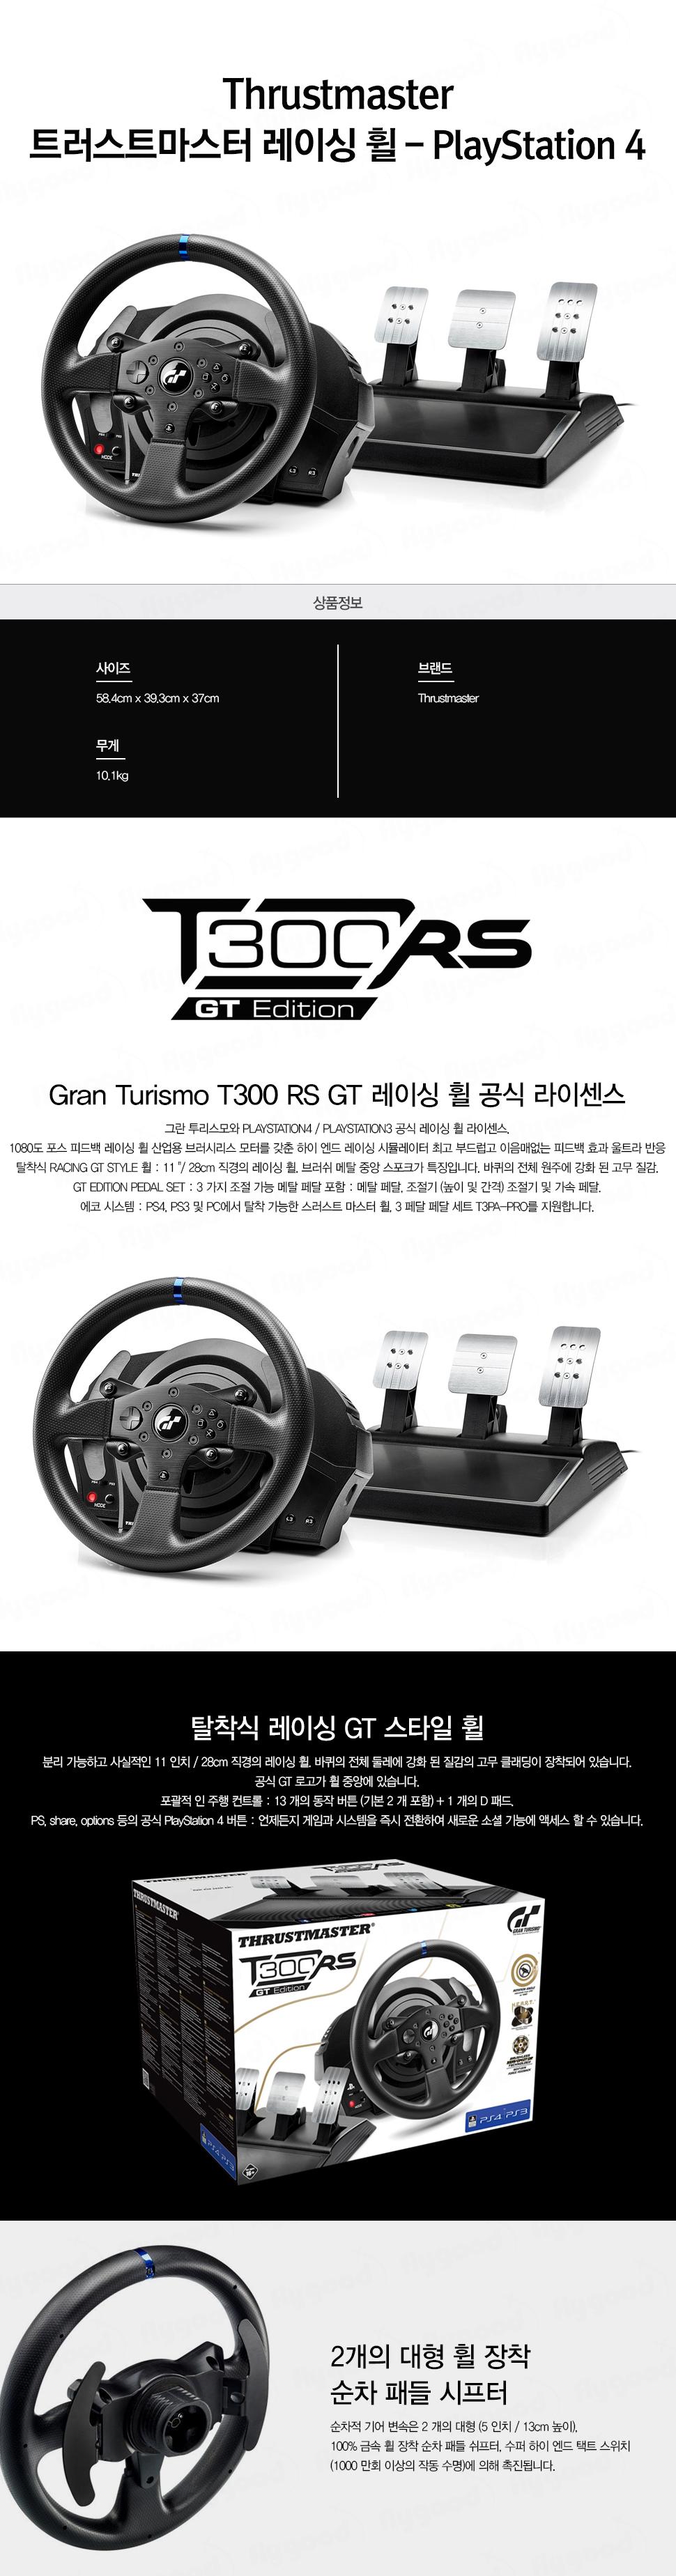 Thrustmaster_T300_RS_GT_Racing_Wheel-PlayStation4_01.jpg